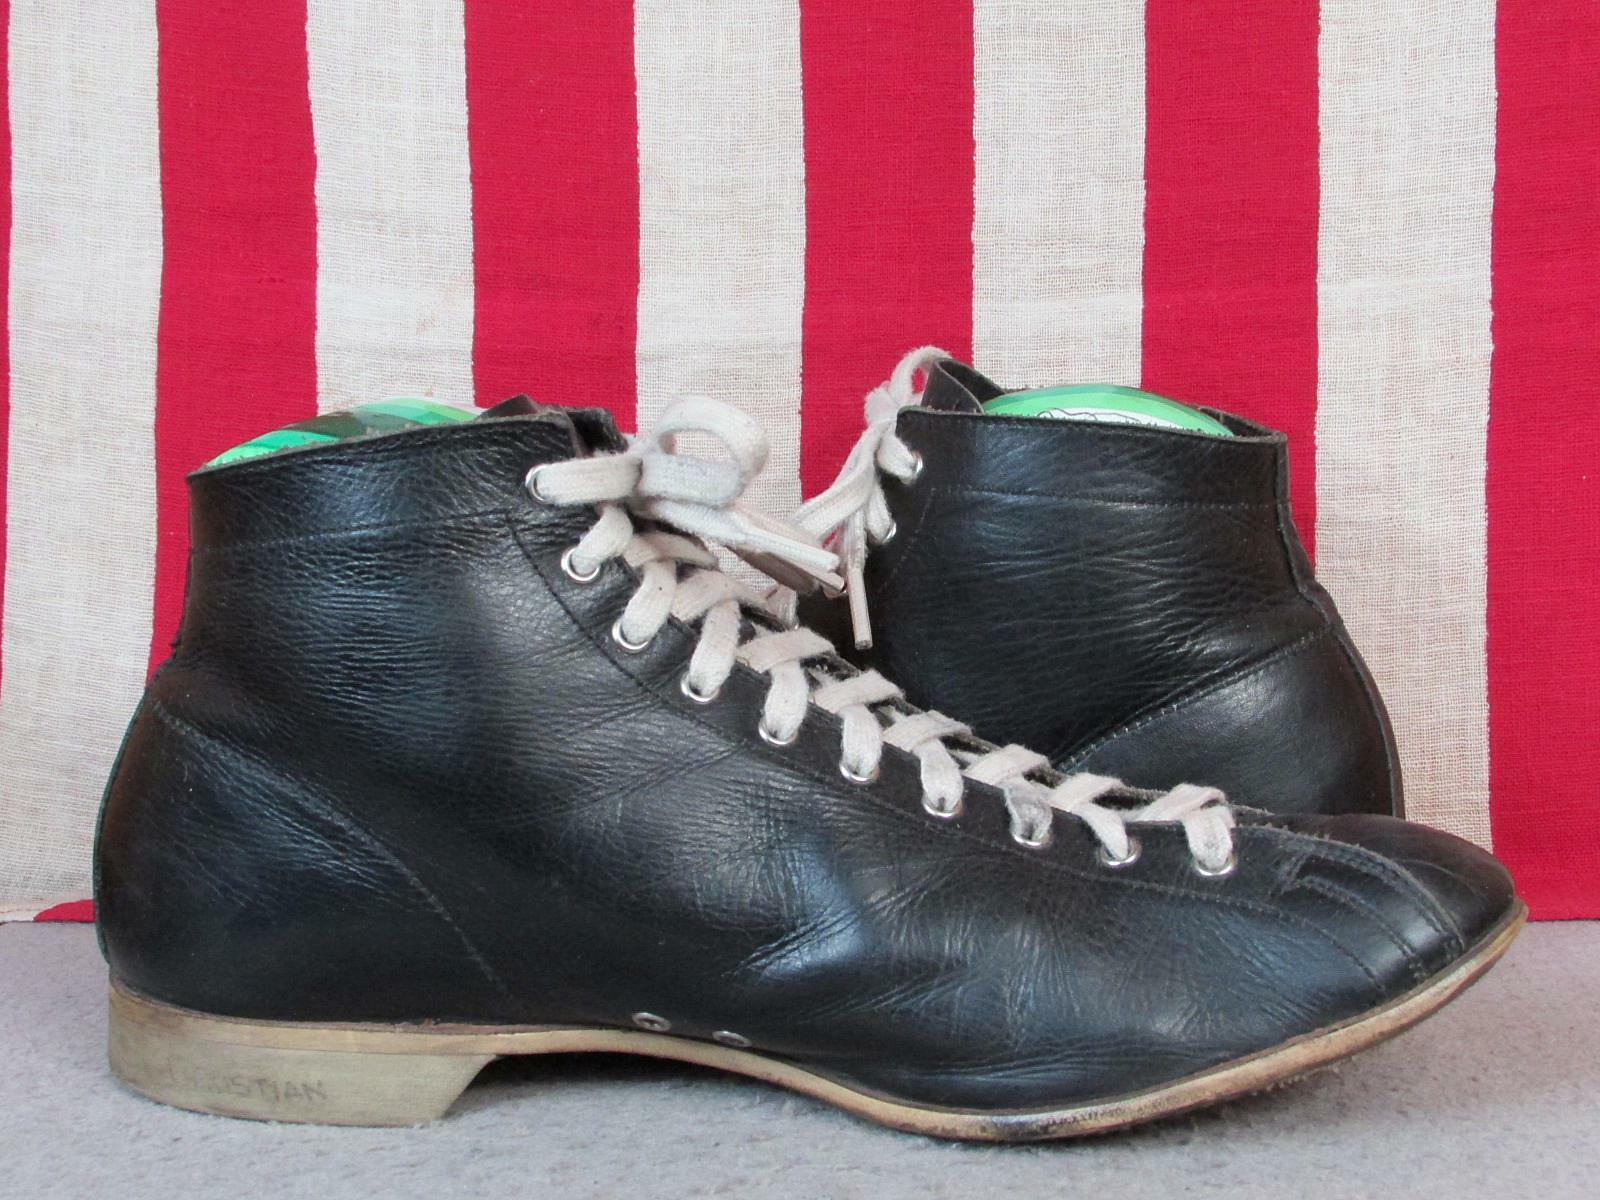 Vintage 1930s Black Leather High Top Athletic Sho… - image 6